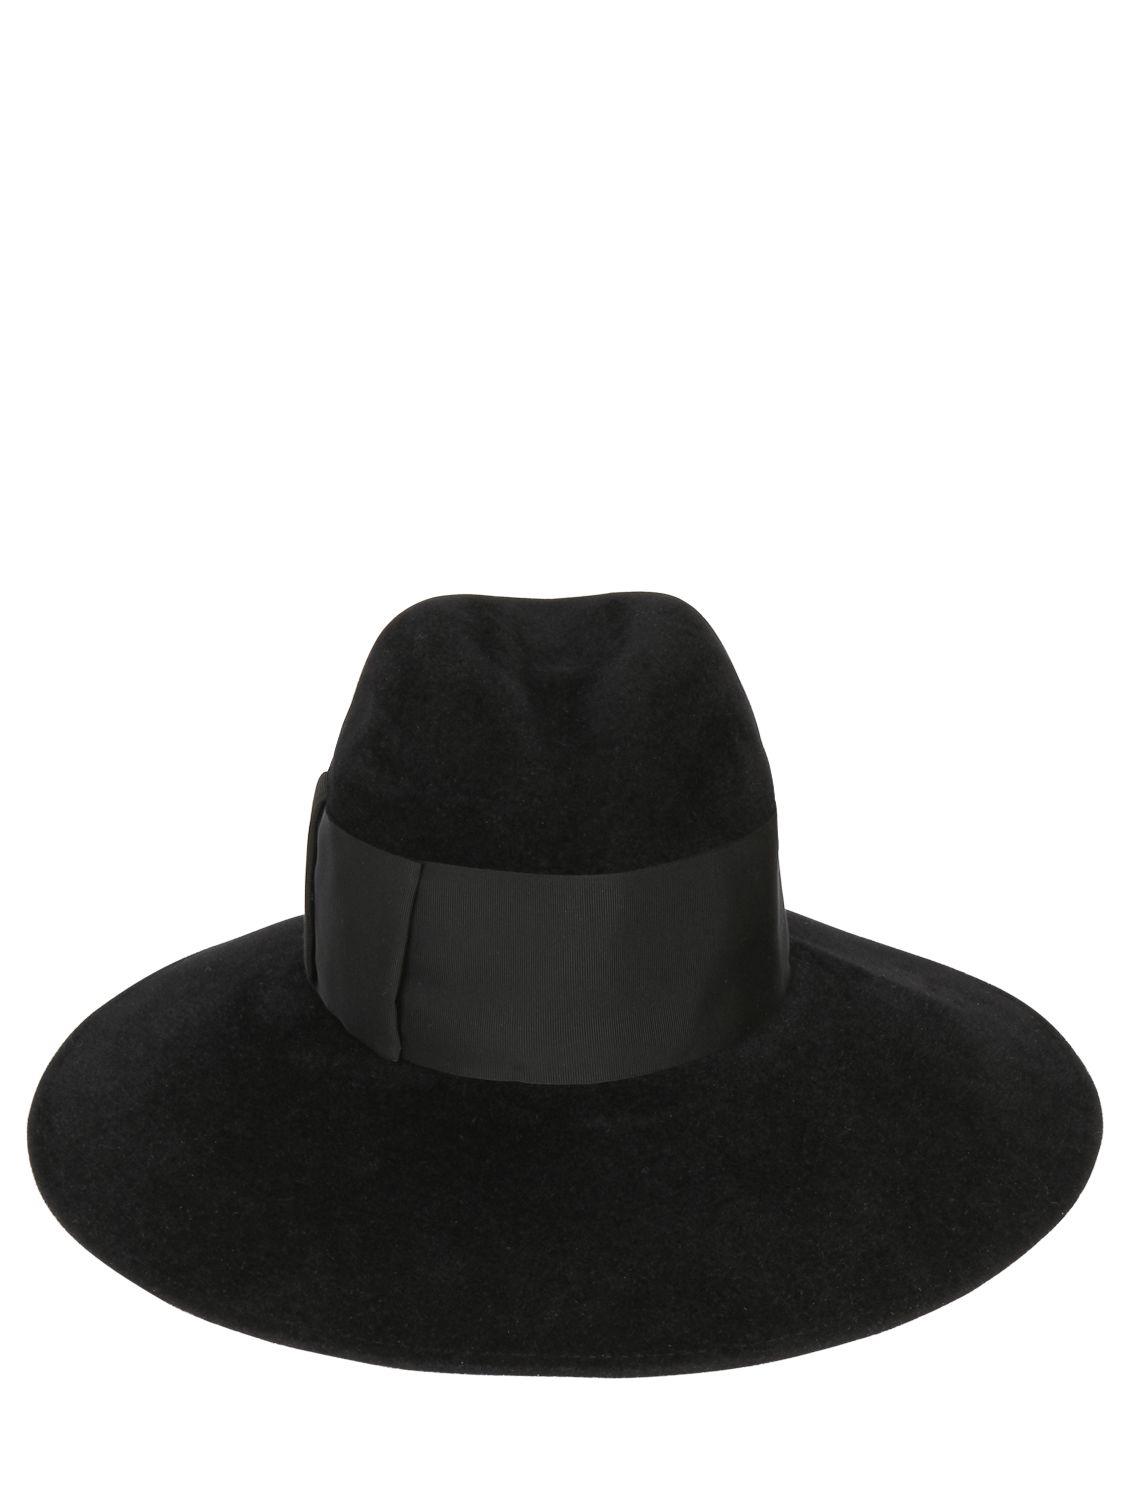 f7bcb1dd234 Borsalino Velour Lapin Fur Felt Wide Brim Hat in Black for Men - Lyst